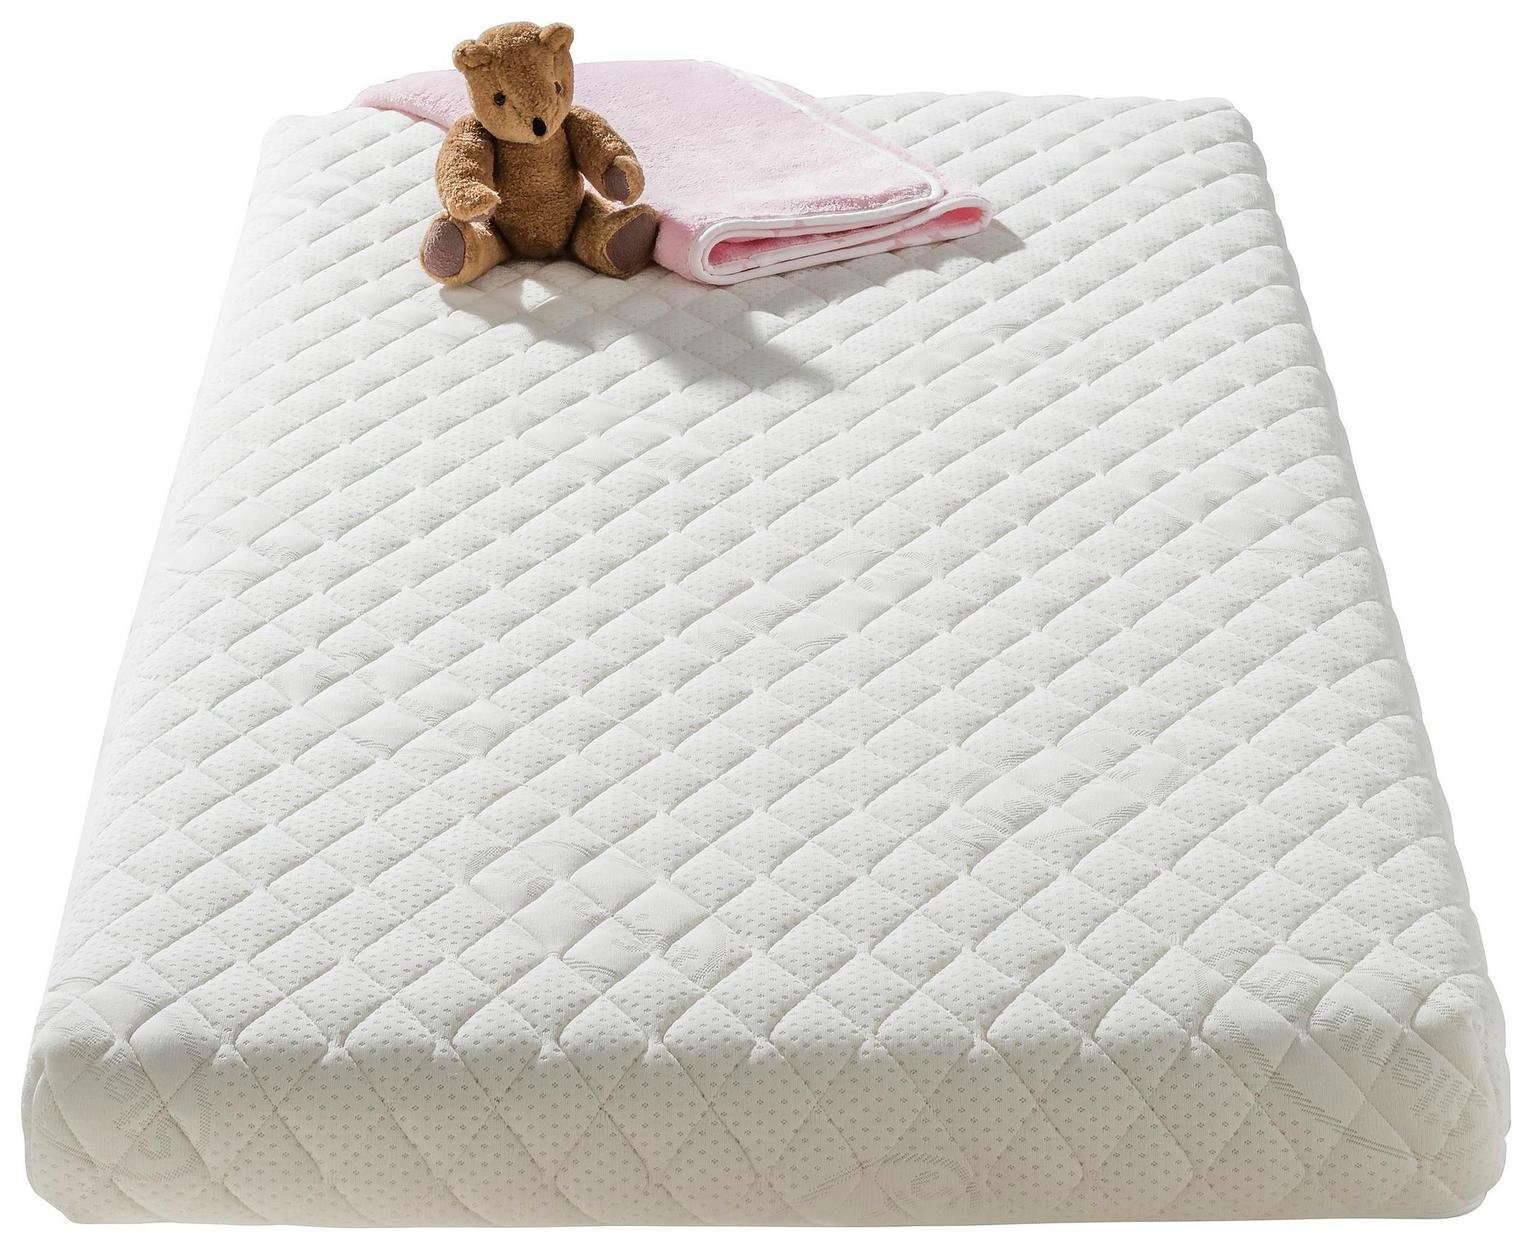 Silentnight Superior Pocket Cot Bed Mattress 70 x 140cm